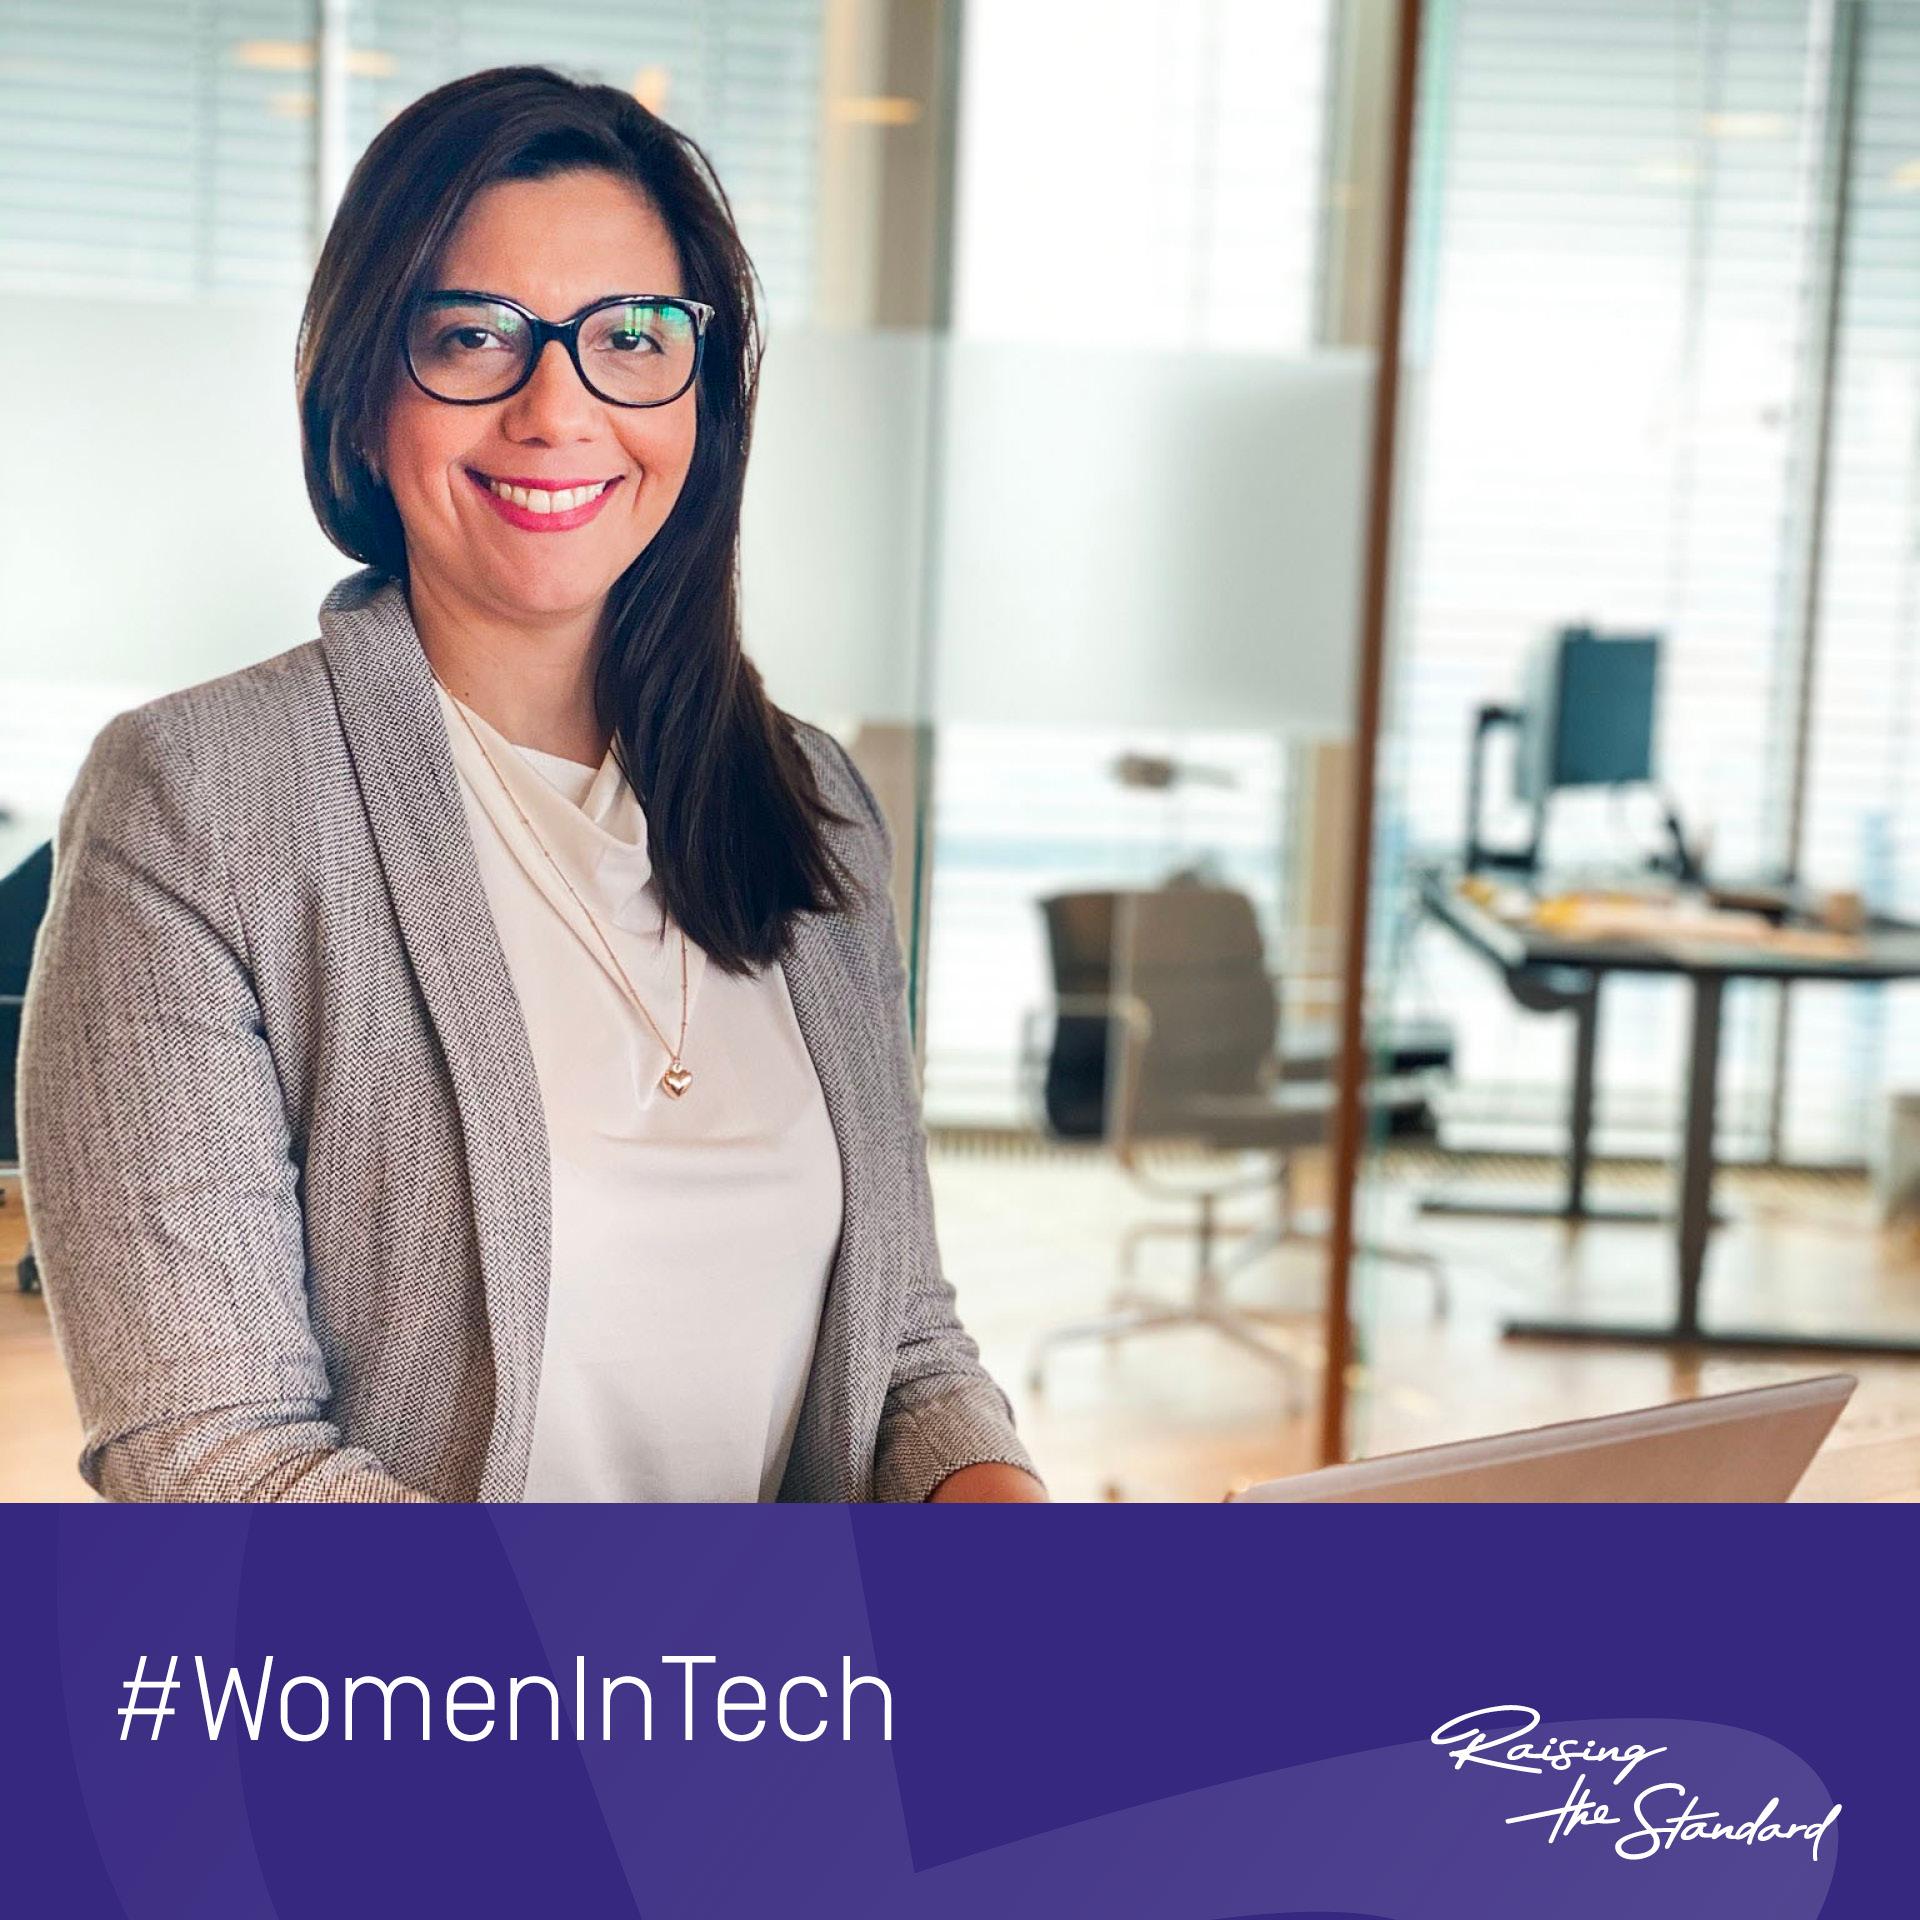 Women in tech (square)2